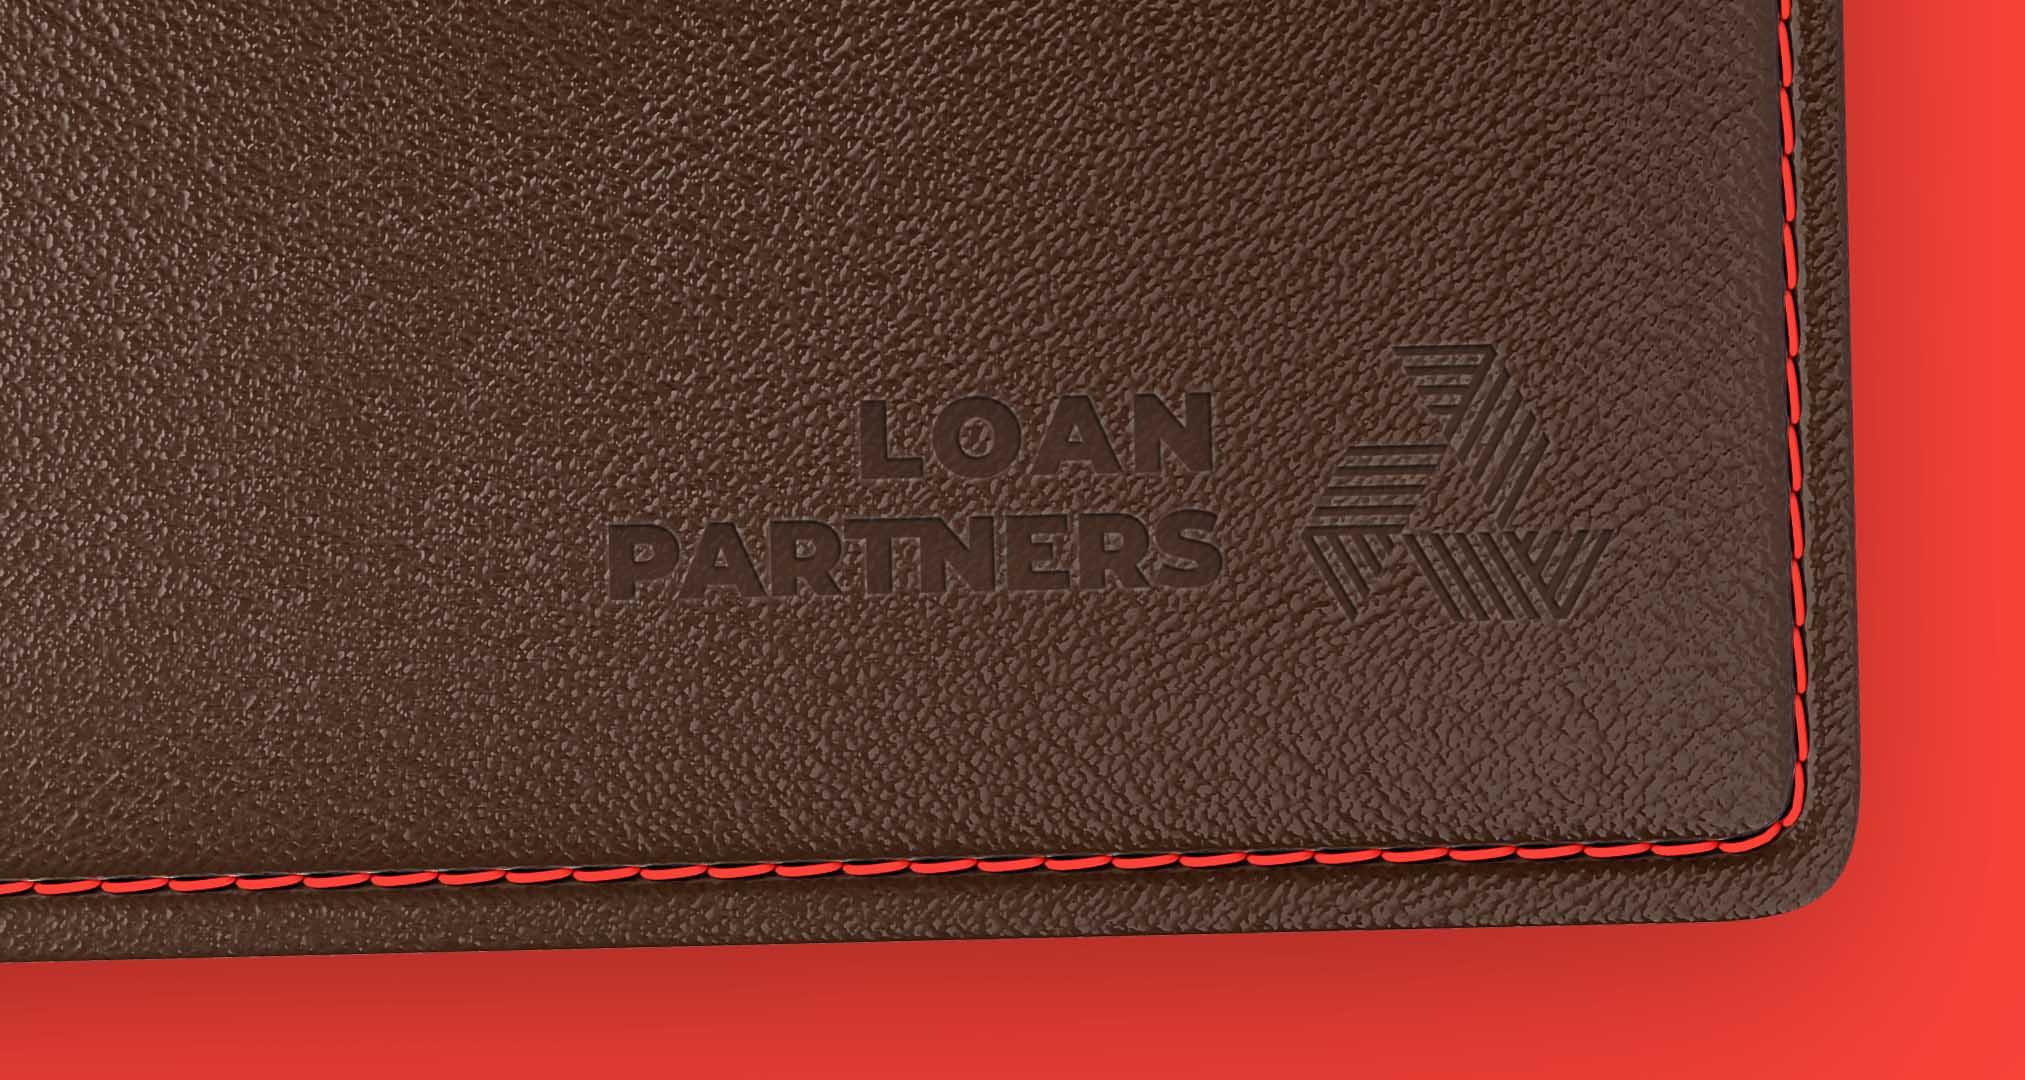 Proyectos / Loan Partners